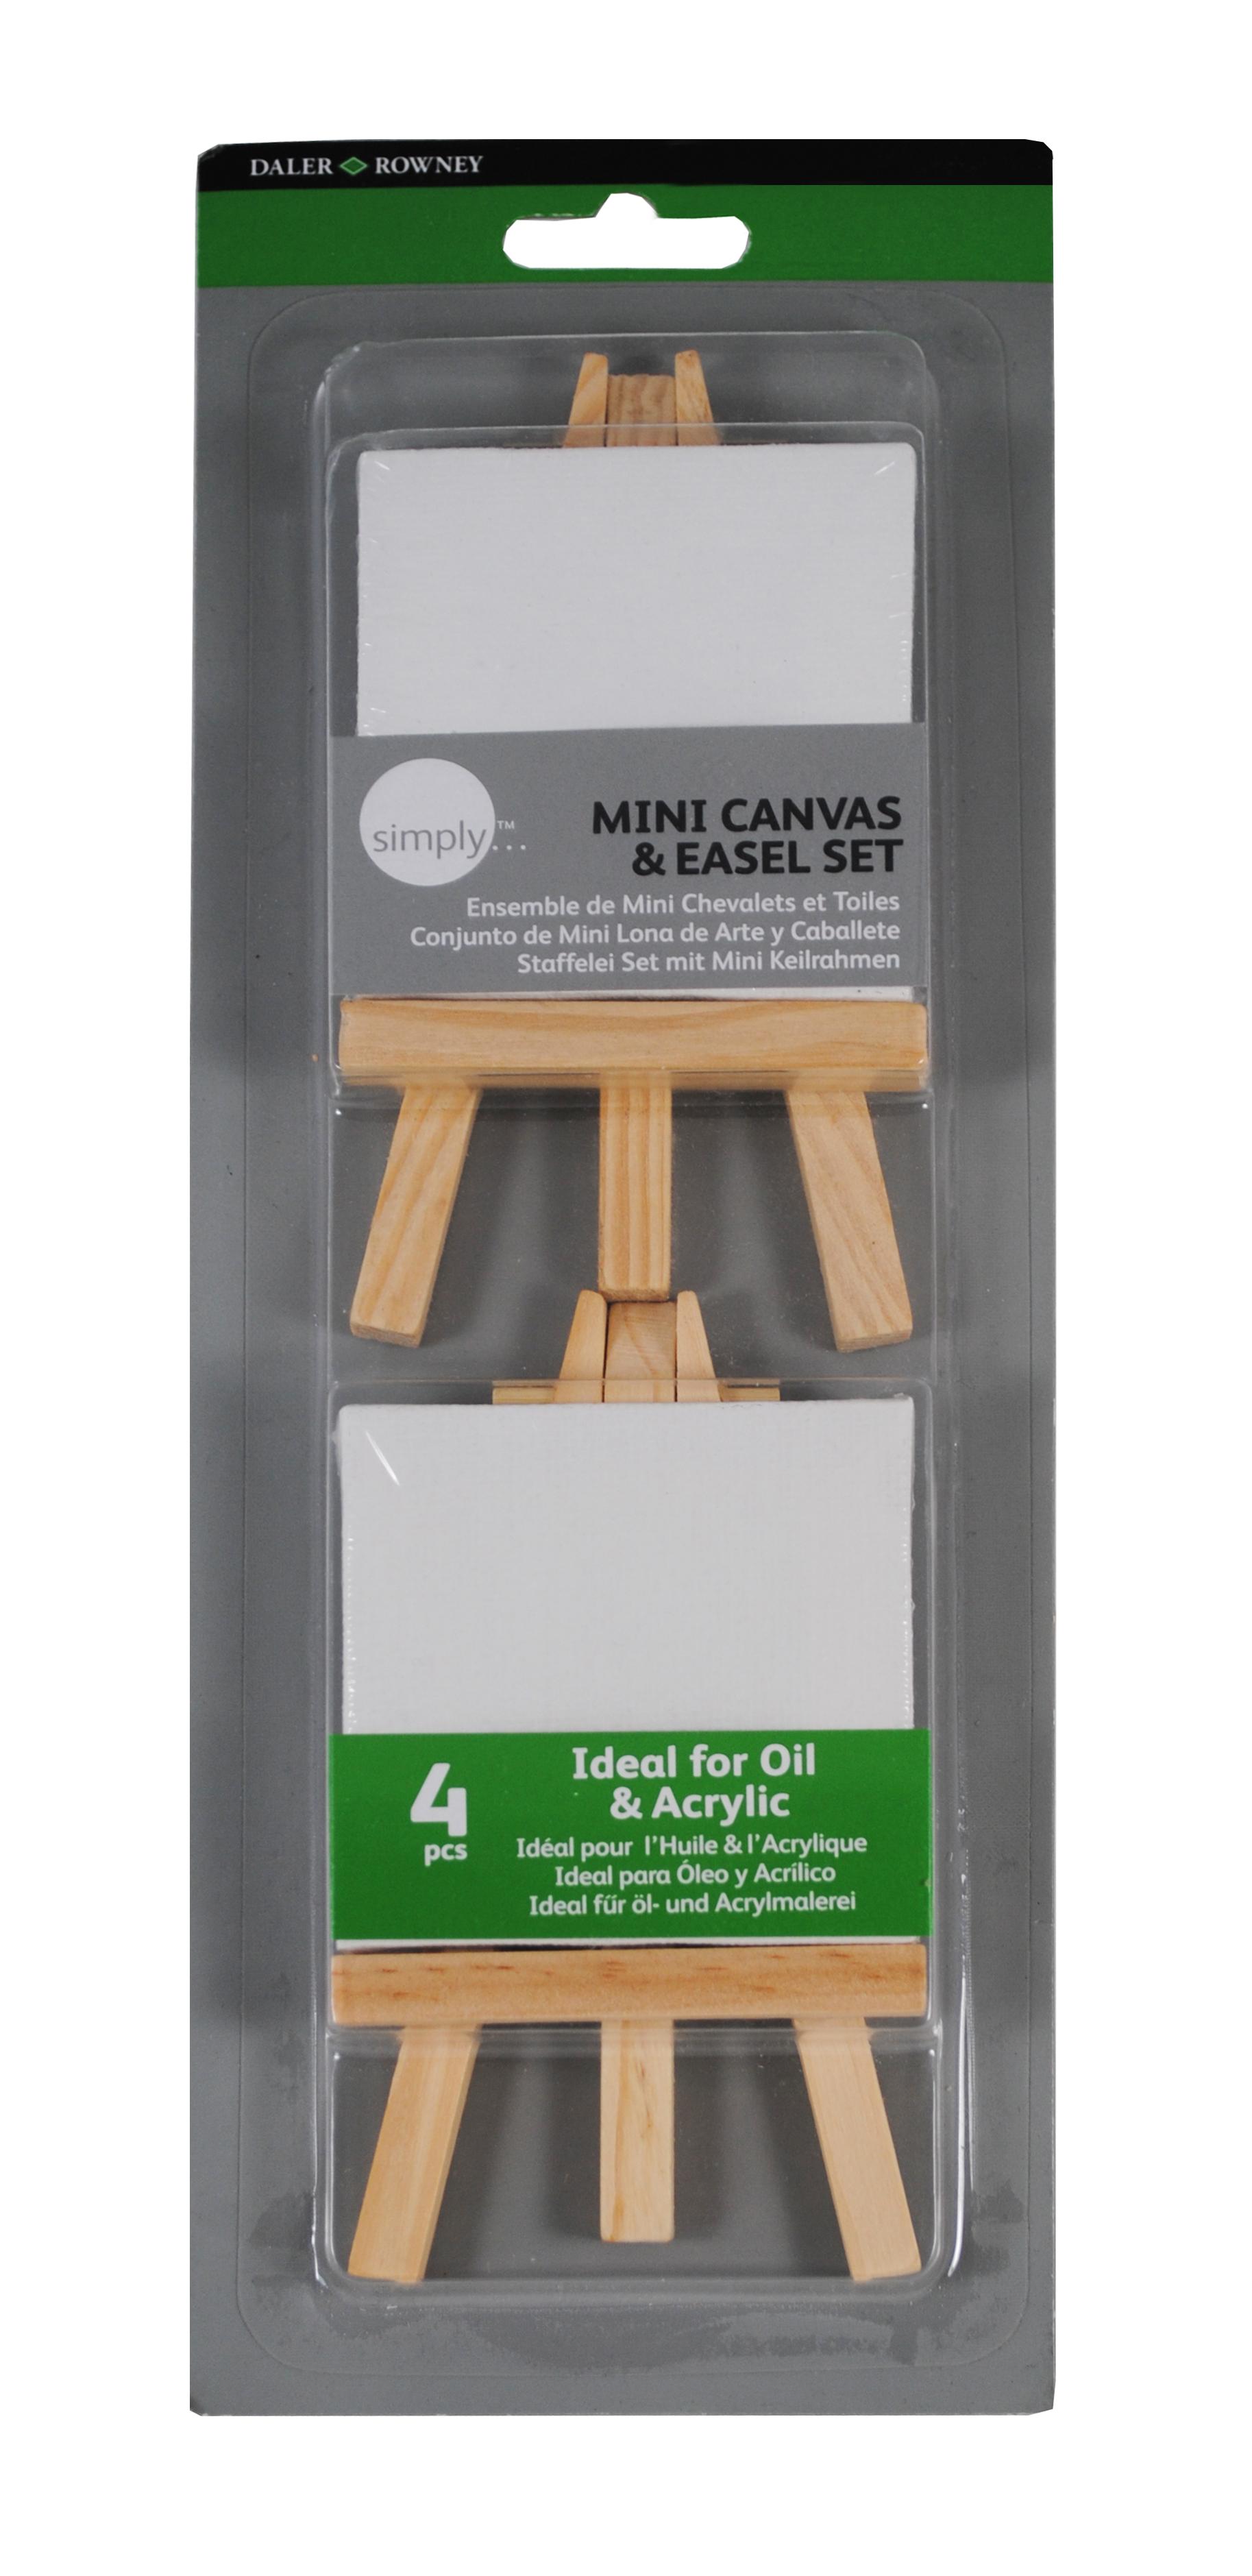 simply 2 Mini Keilrahmen- und Staffeleiset